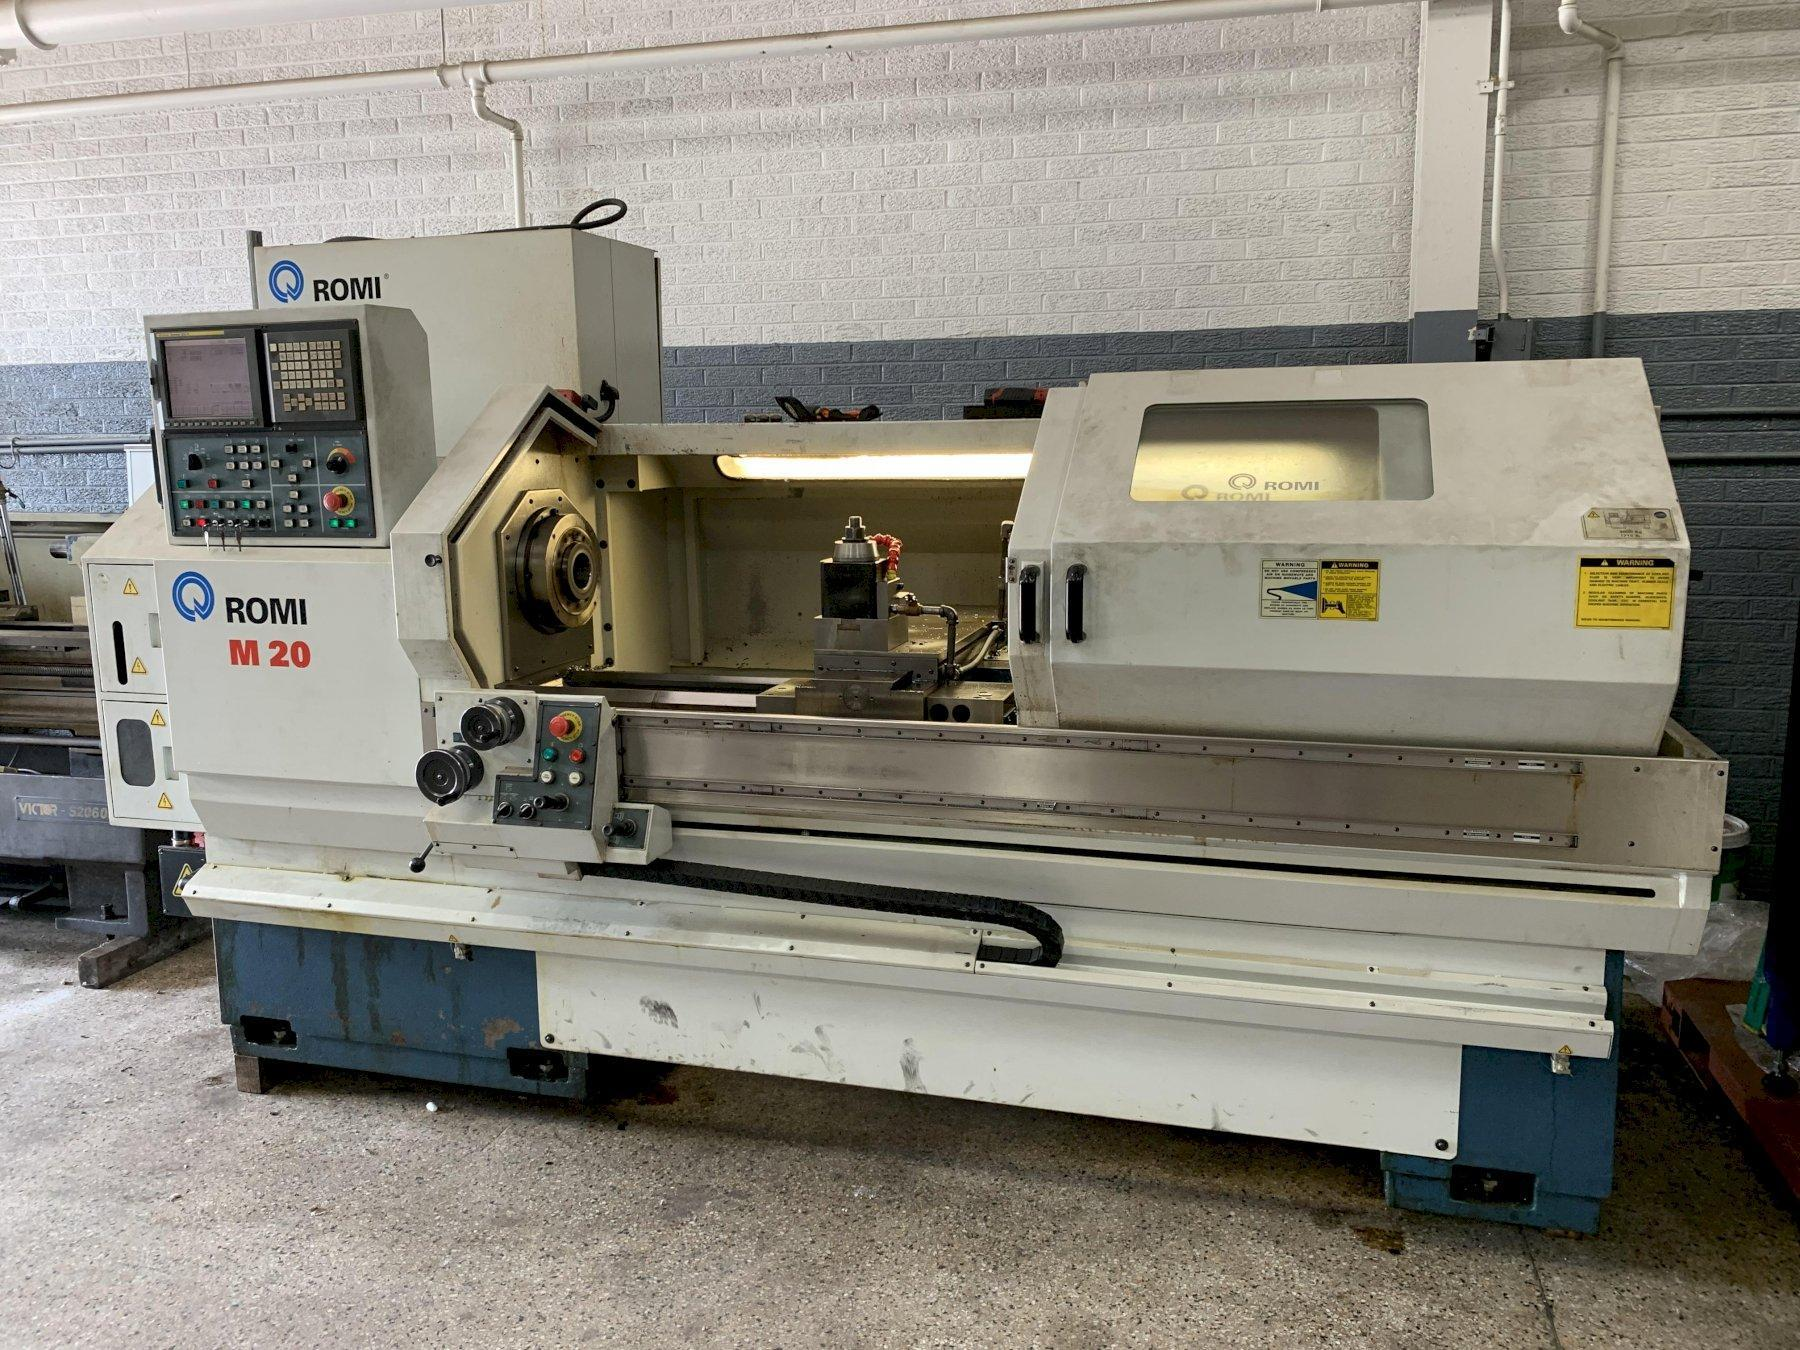 "20"" x 60"" Romi Model M20 CNC Flat Bed Lathe, S/N 002 091791404."